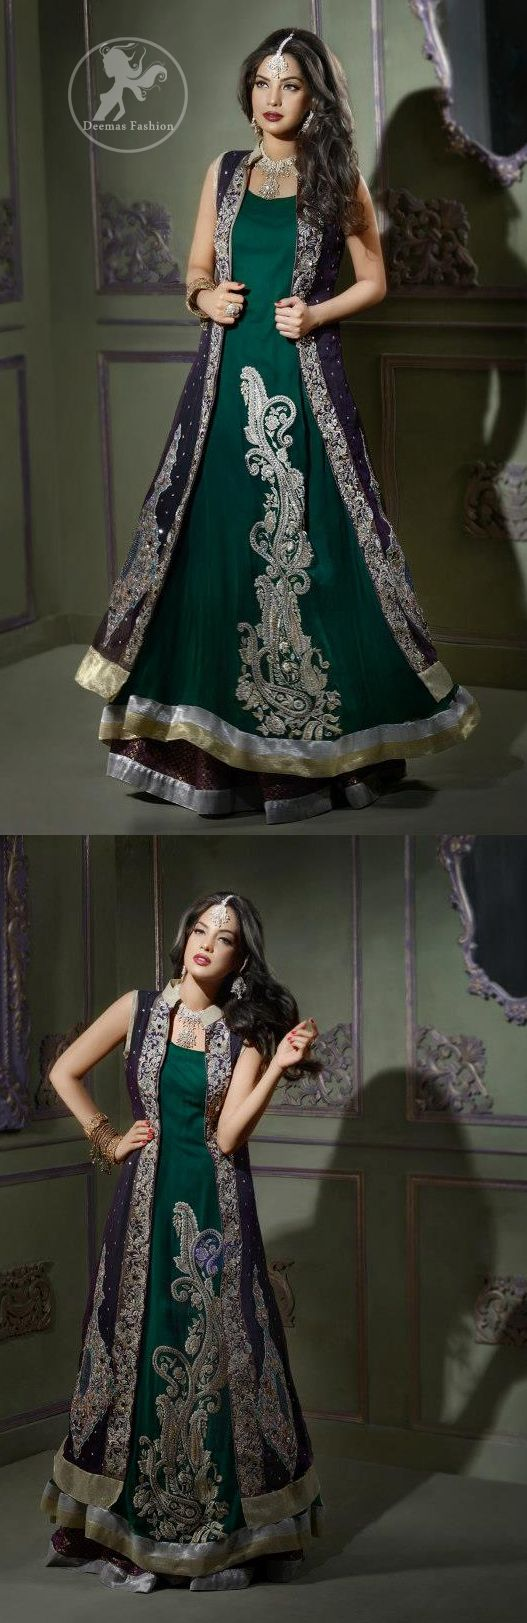 Bottle green front open gown style long dress gowns indian wear